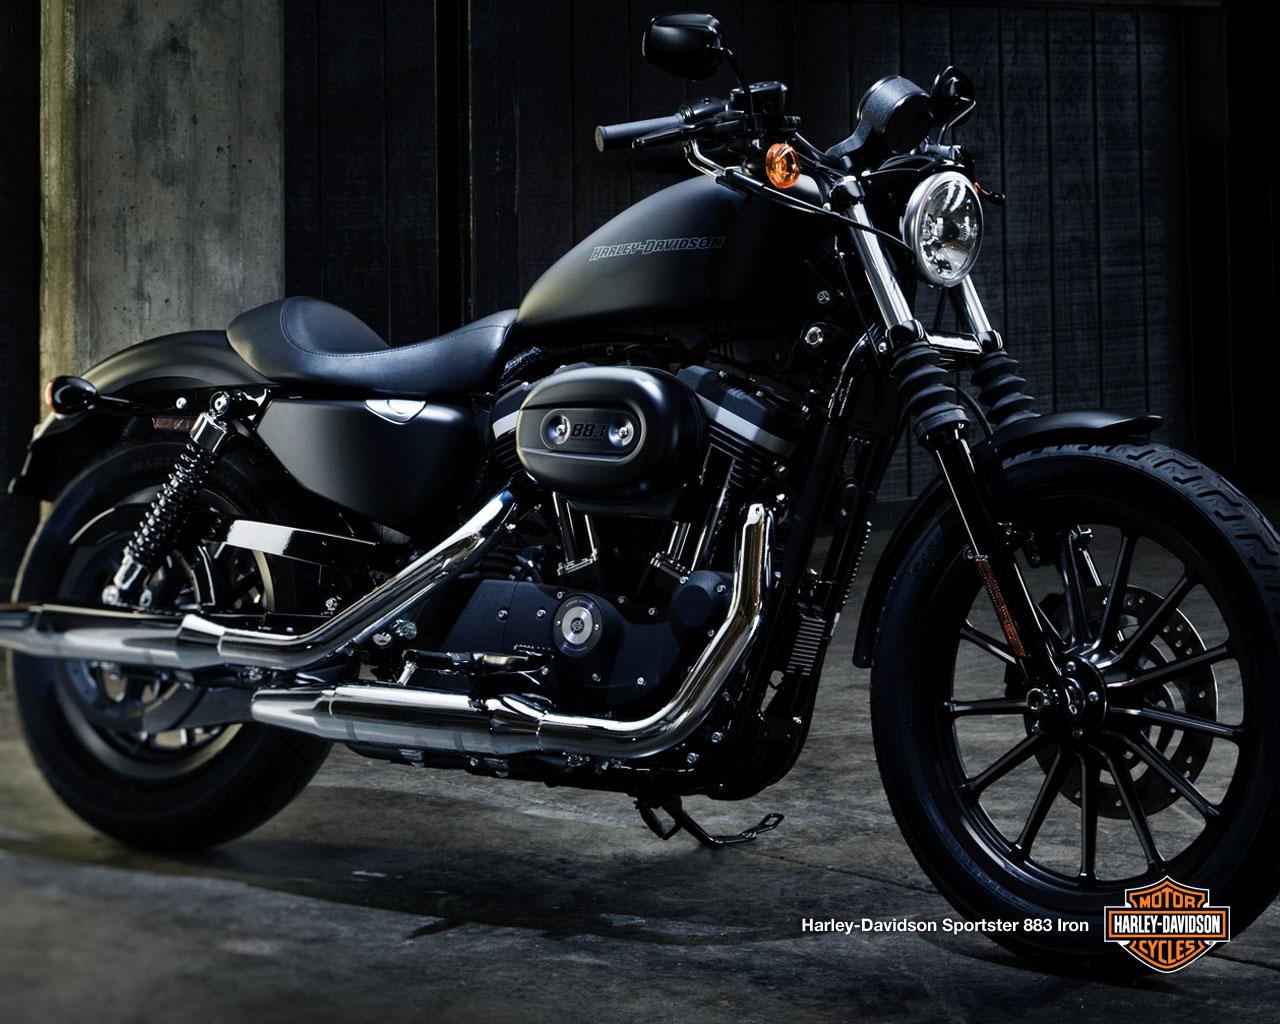 Harley Davidson iron #11